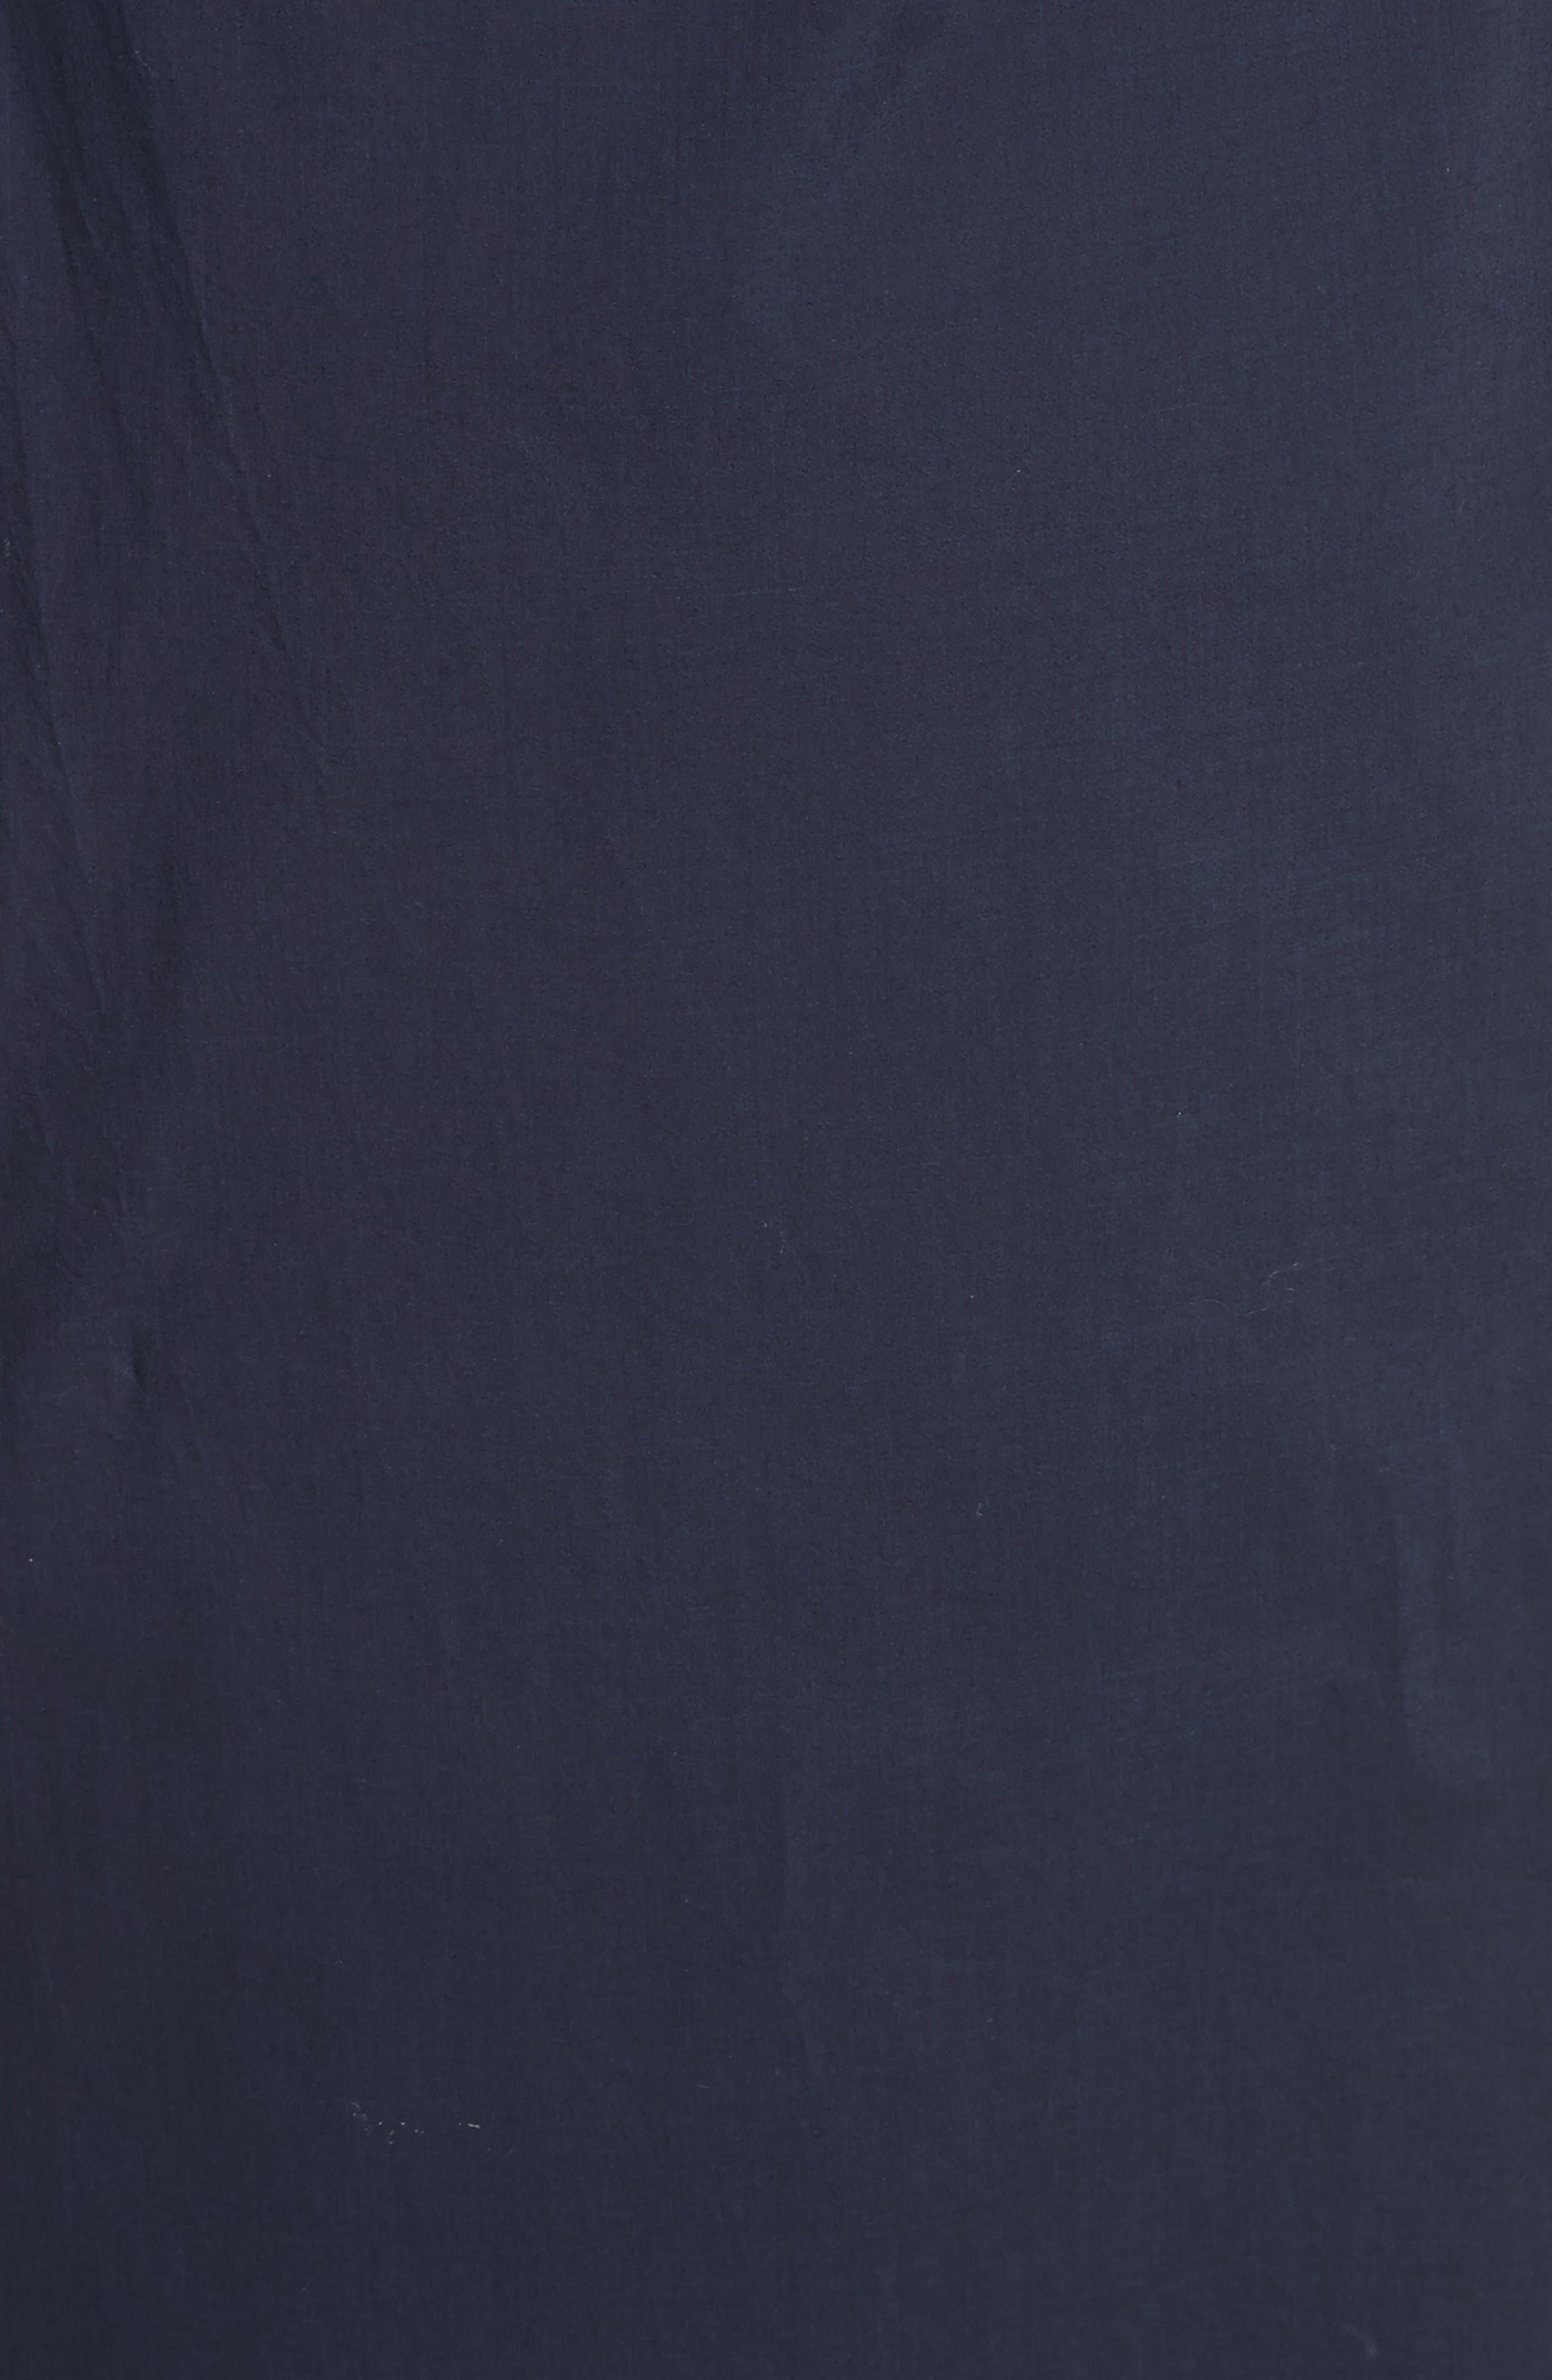 Clota Ruched One-Shoulder Poplin Dress,                             Alternate thumbnail 5, color,                             400